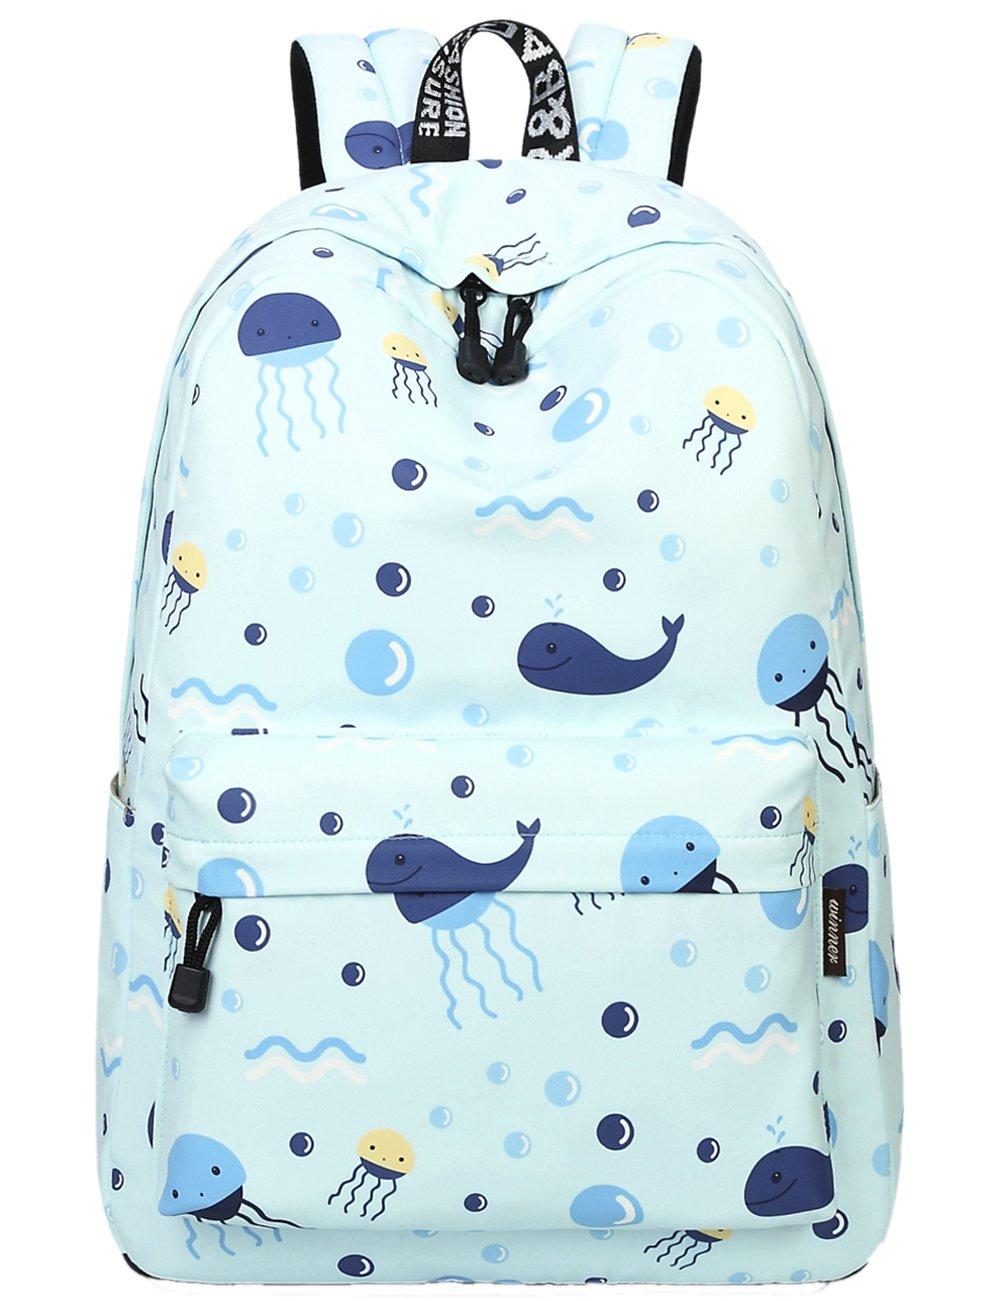 5149462ce6 Amazon.com  School Bookbags for Girls